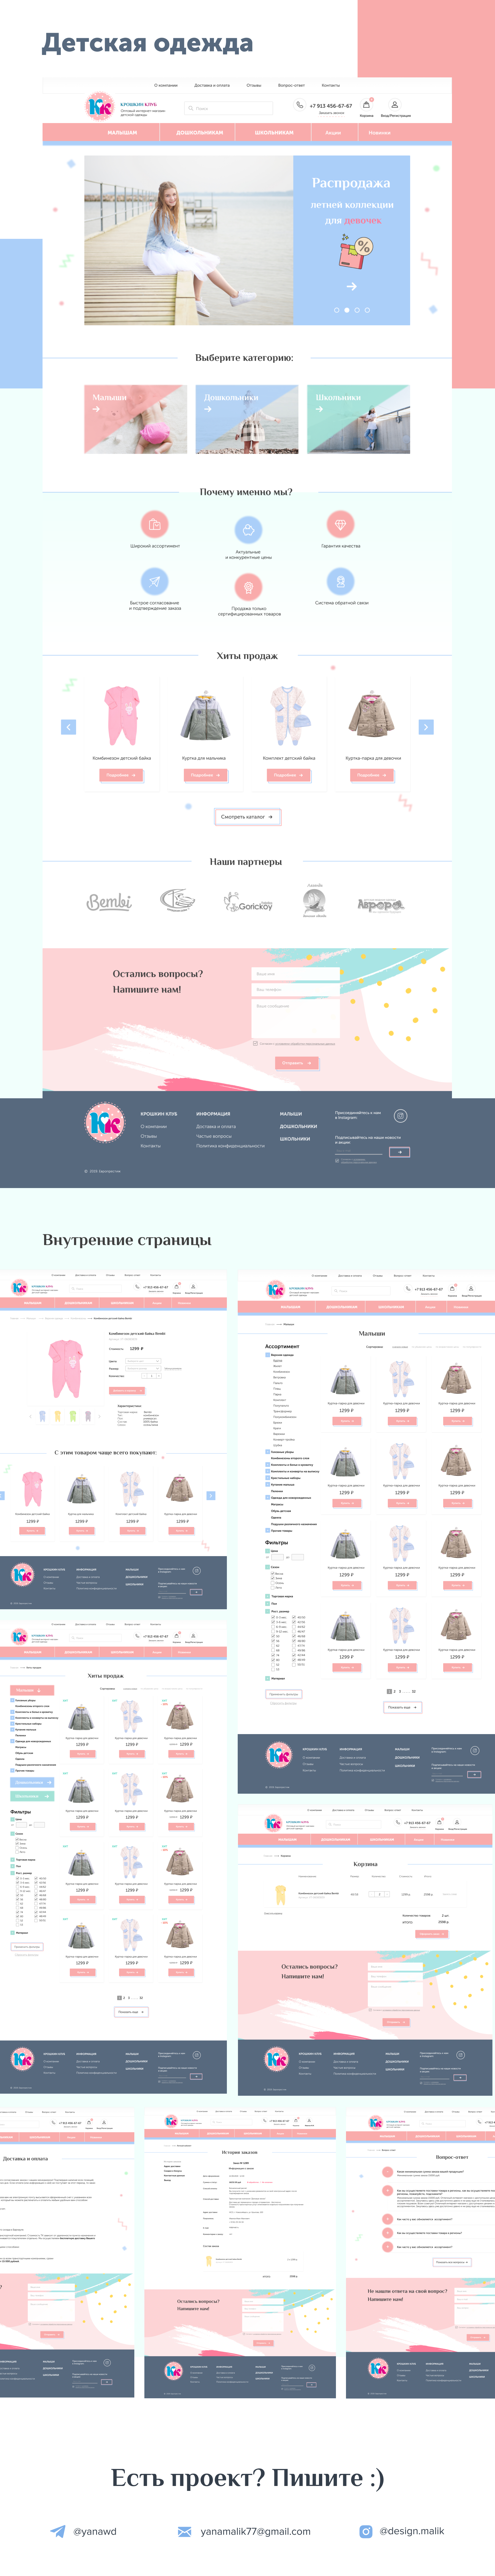 Интернет-магазин Крошкин клуб